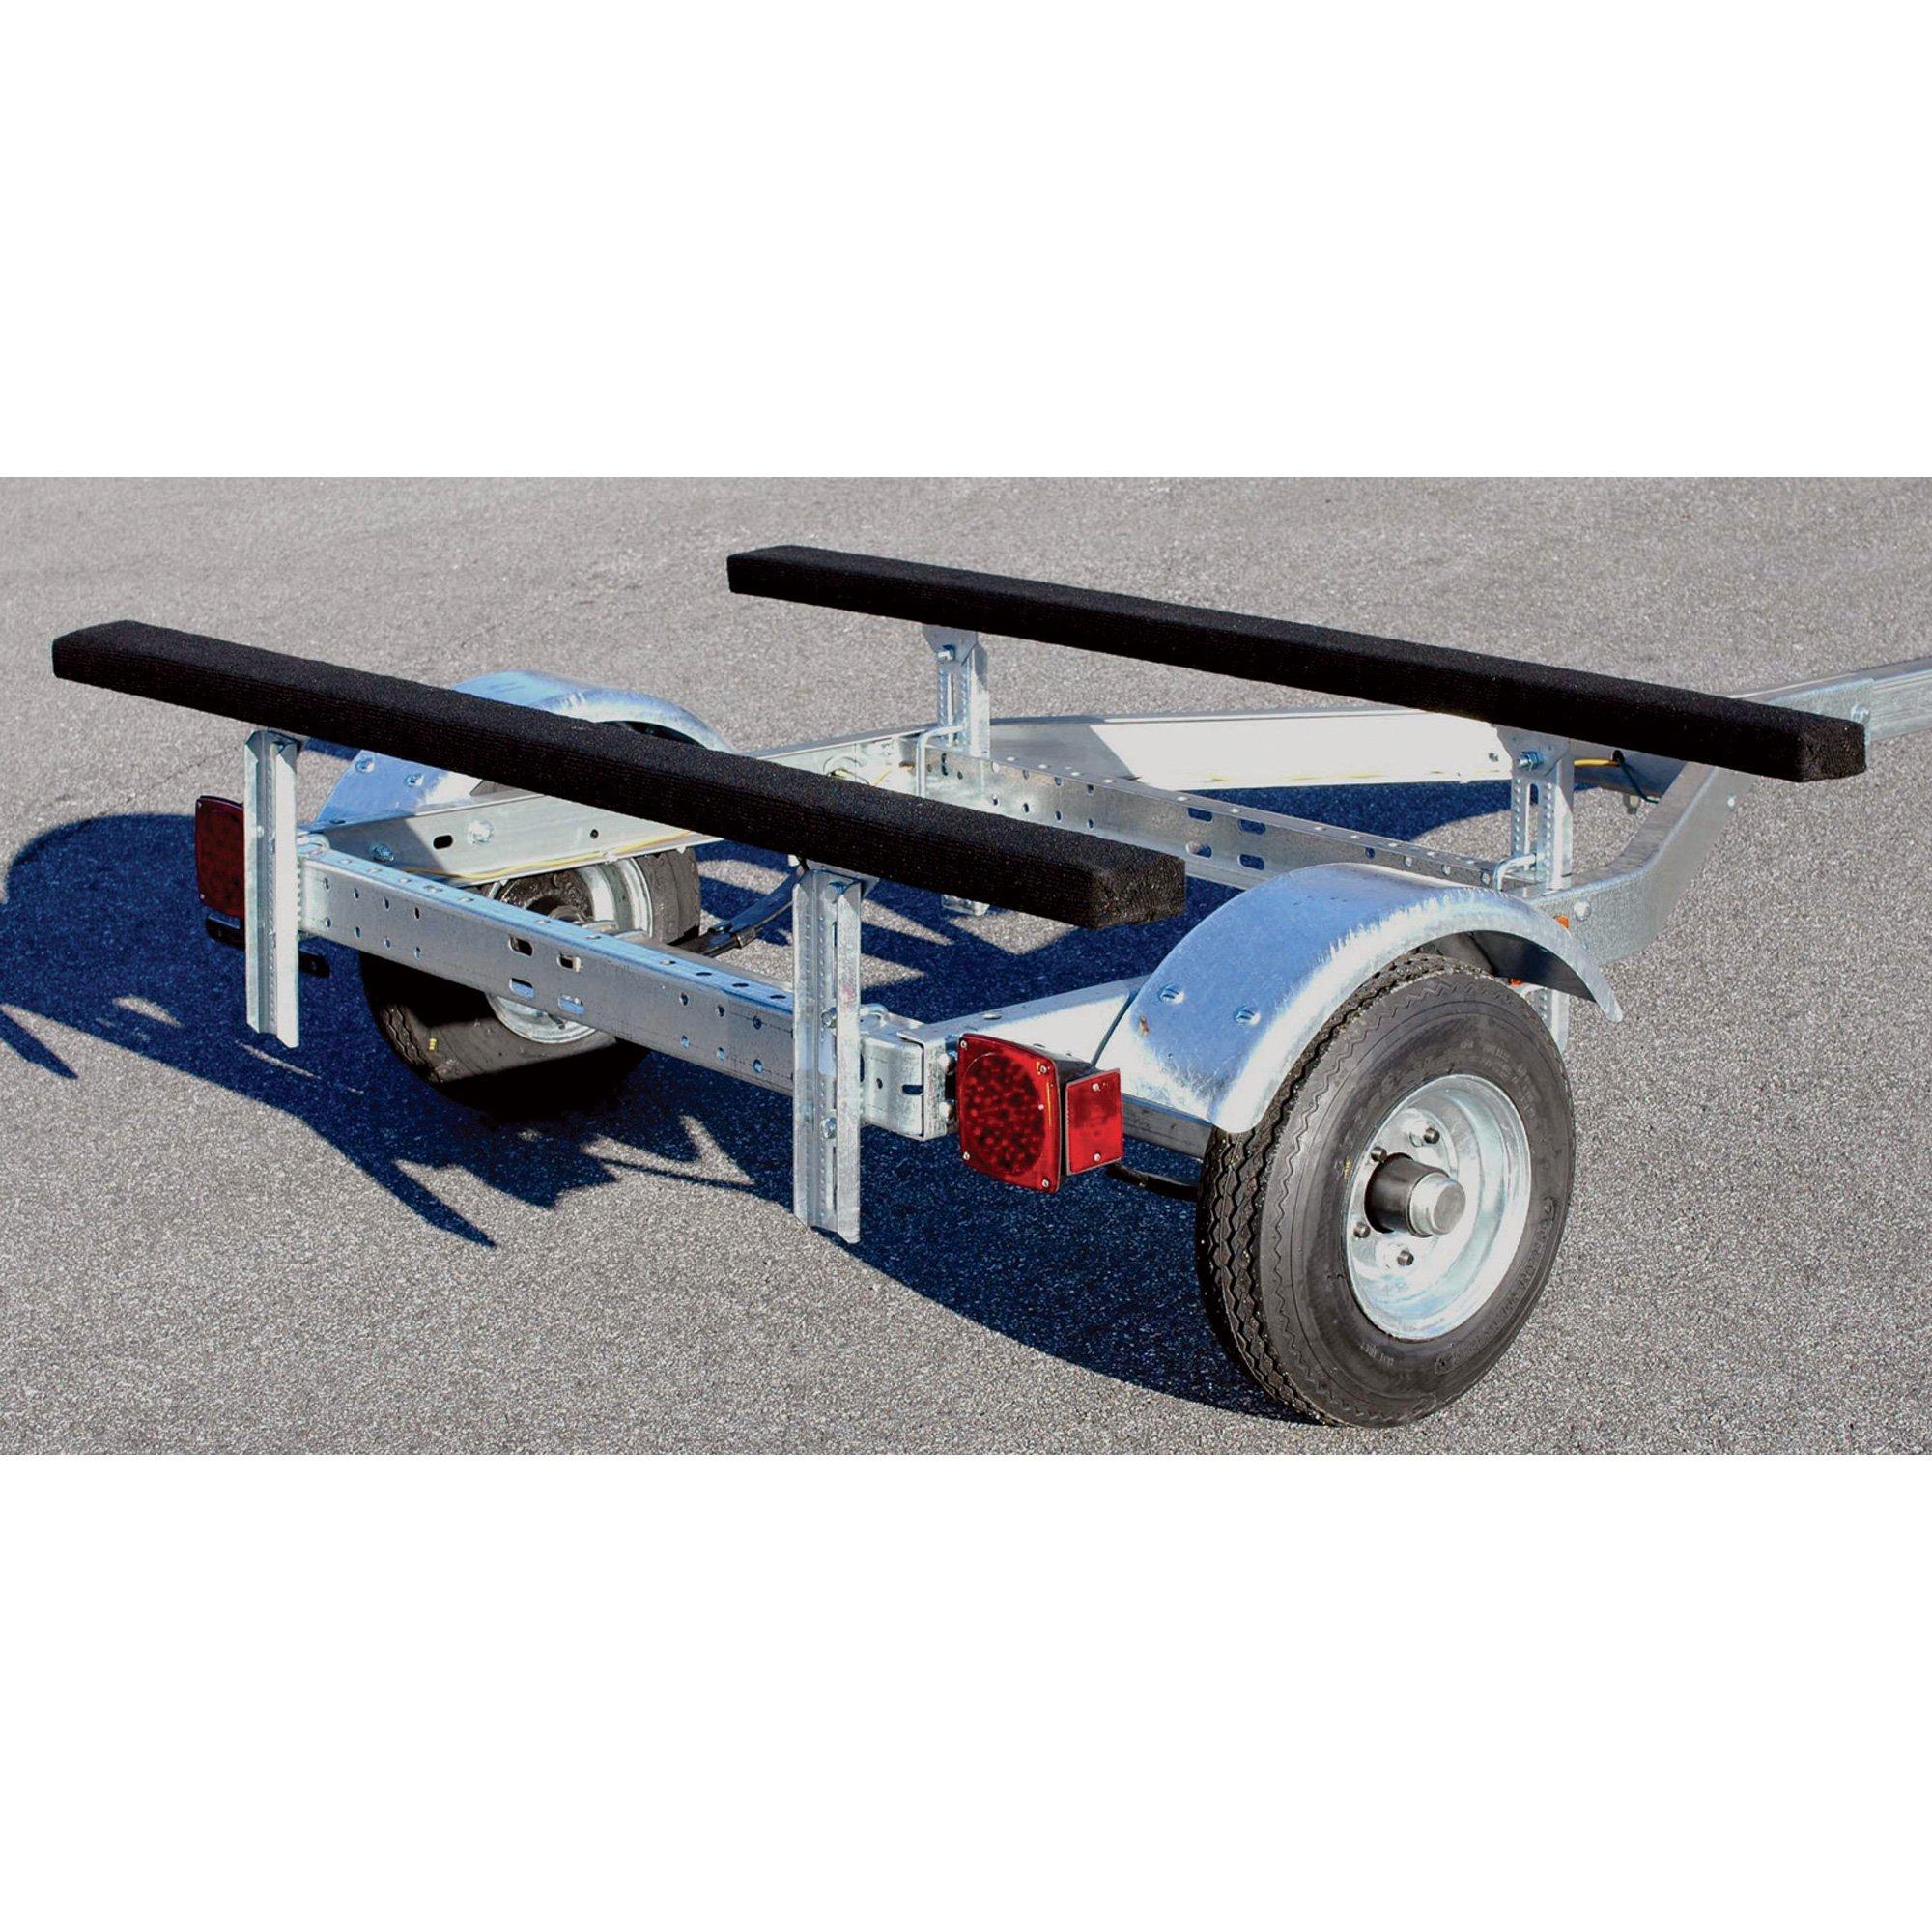 - C.E. Smith Multi-Sport Trailer - 11ft.8in.L x 4ft.6in.W, 800-Lb. Load Capacity, Model# 48810 by CE Smith